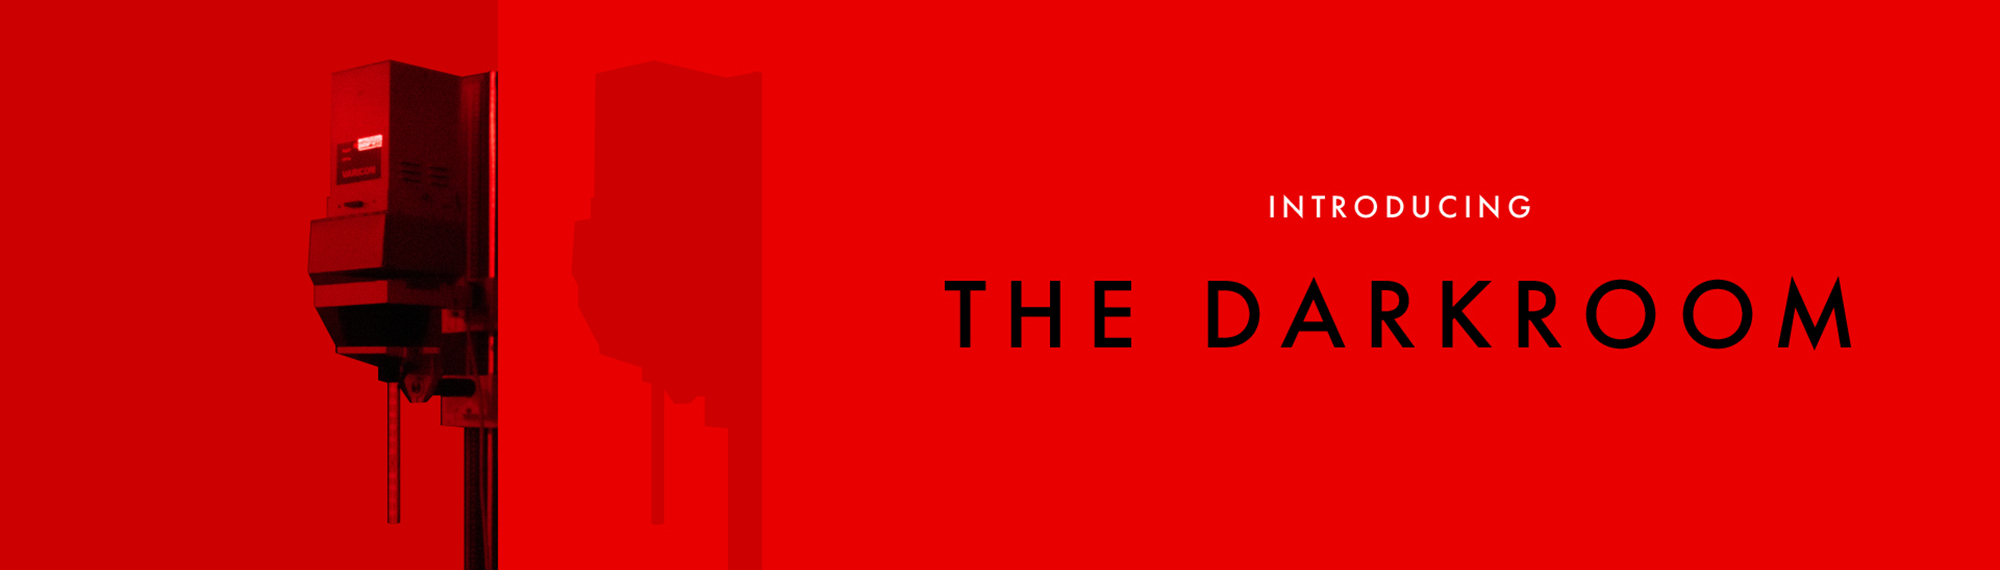 Darkroom Banner FINAL.cdr